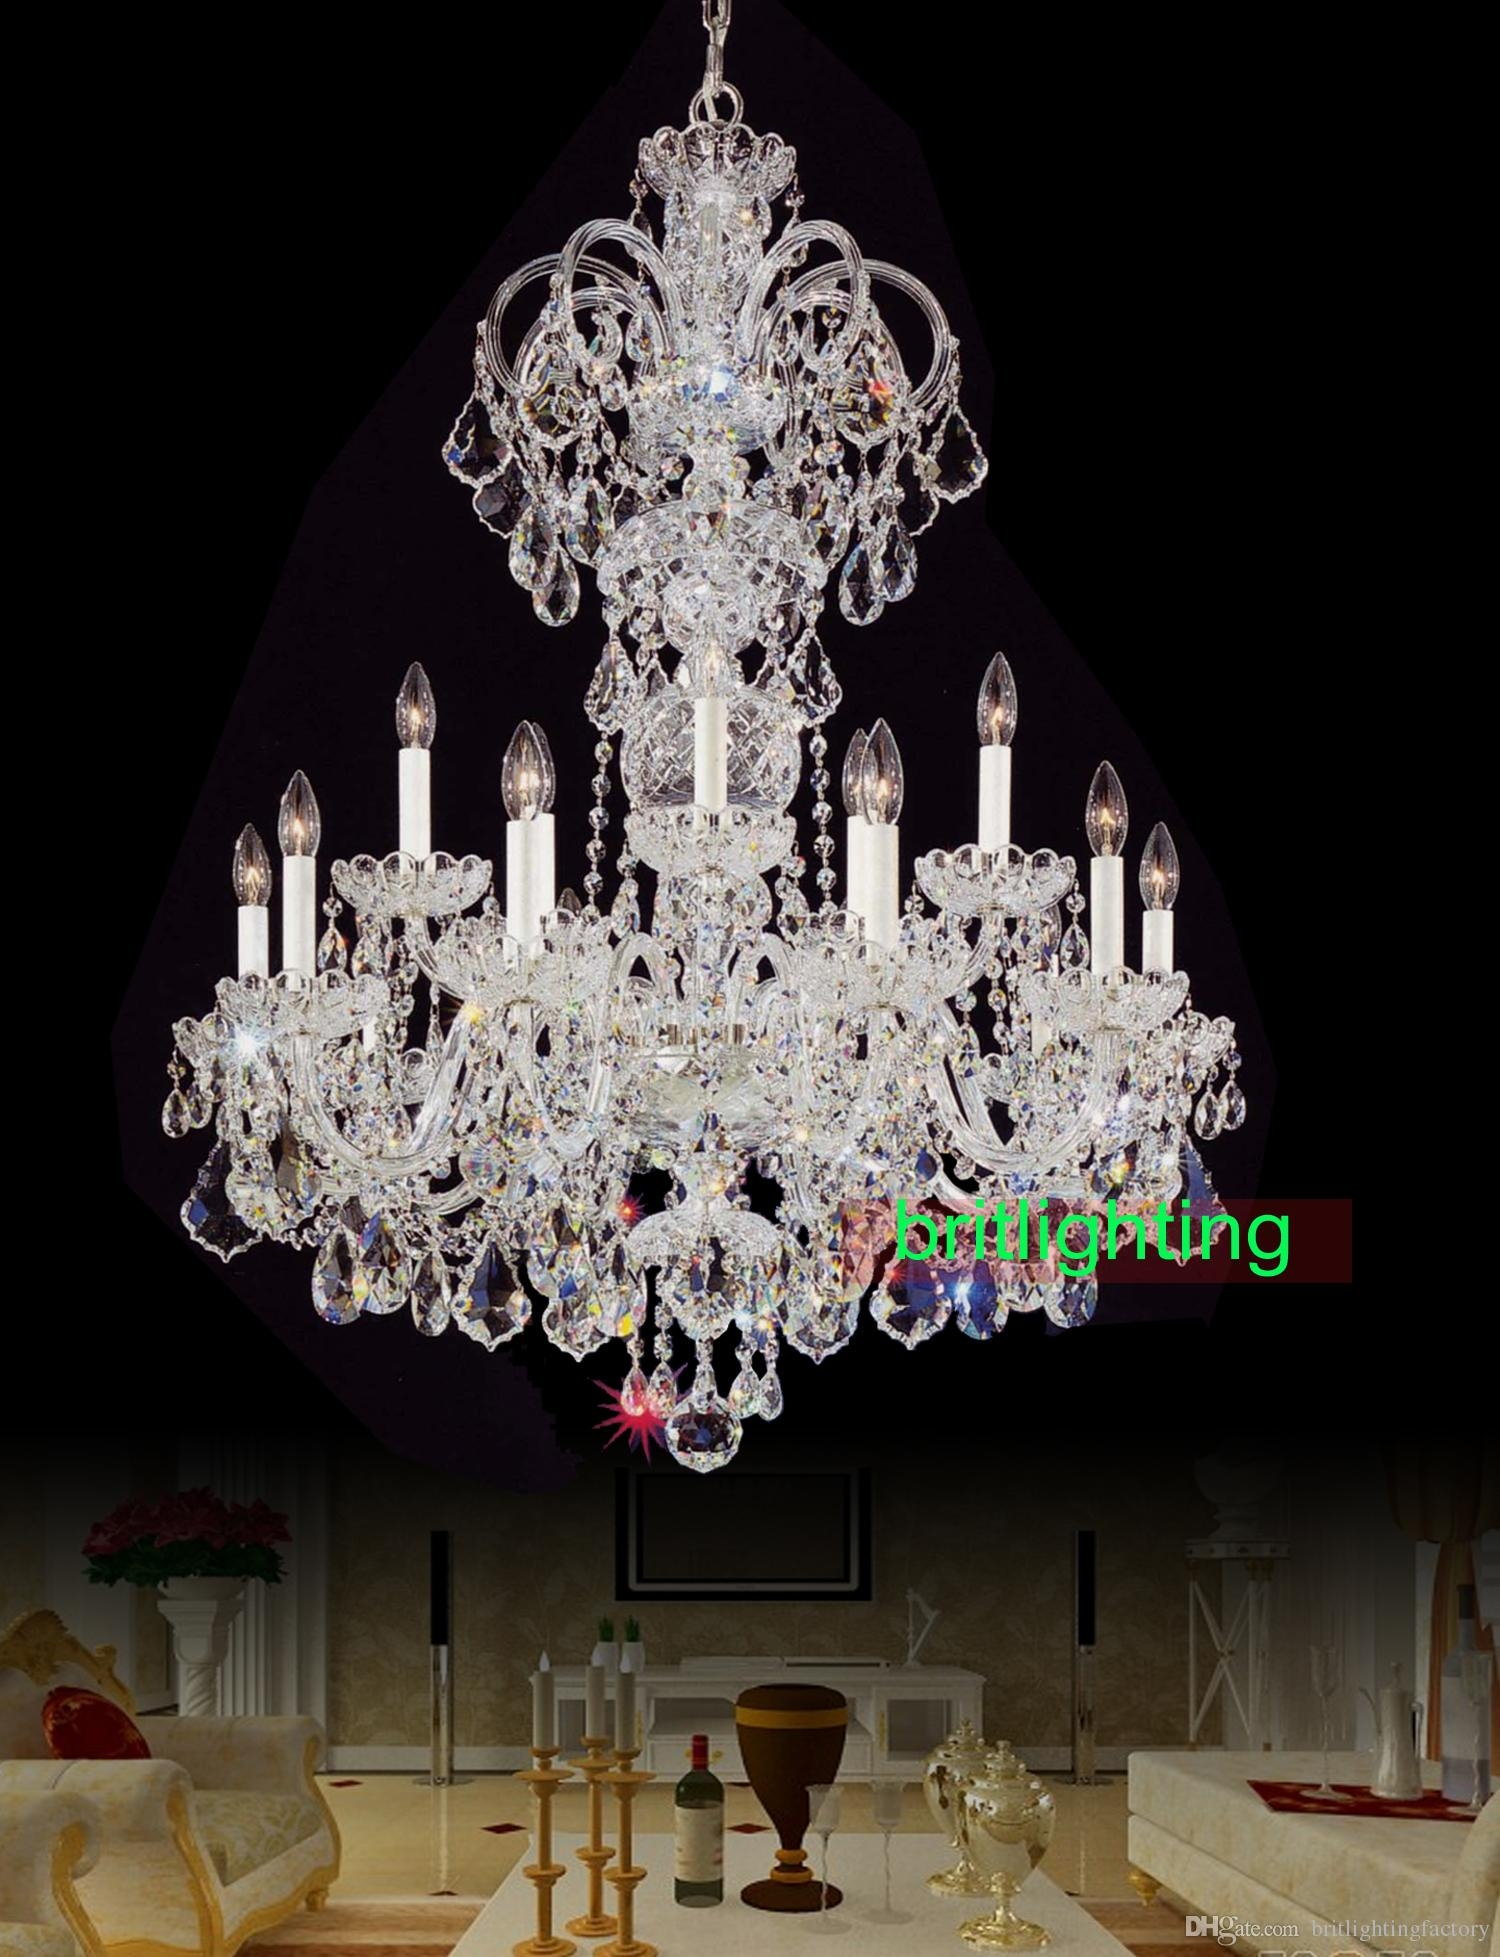 Modern Big Chandelier Lamps European Candle Chandeliers Versailles Within Restaurant Chandeliers (View 11 of 15)